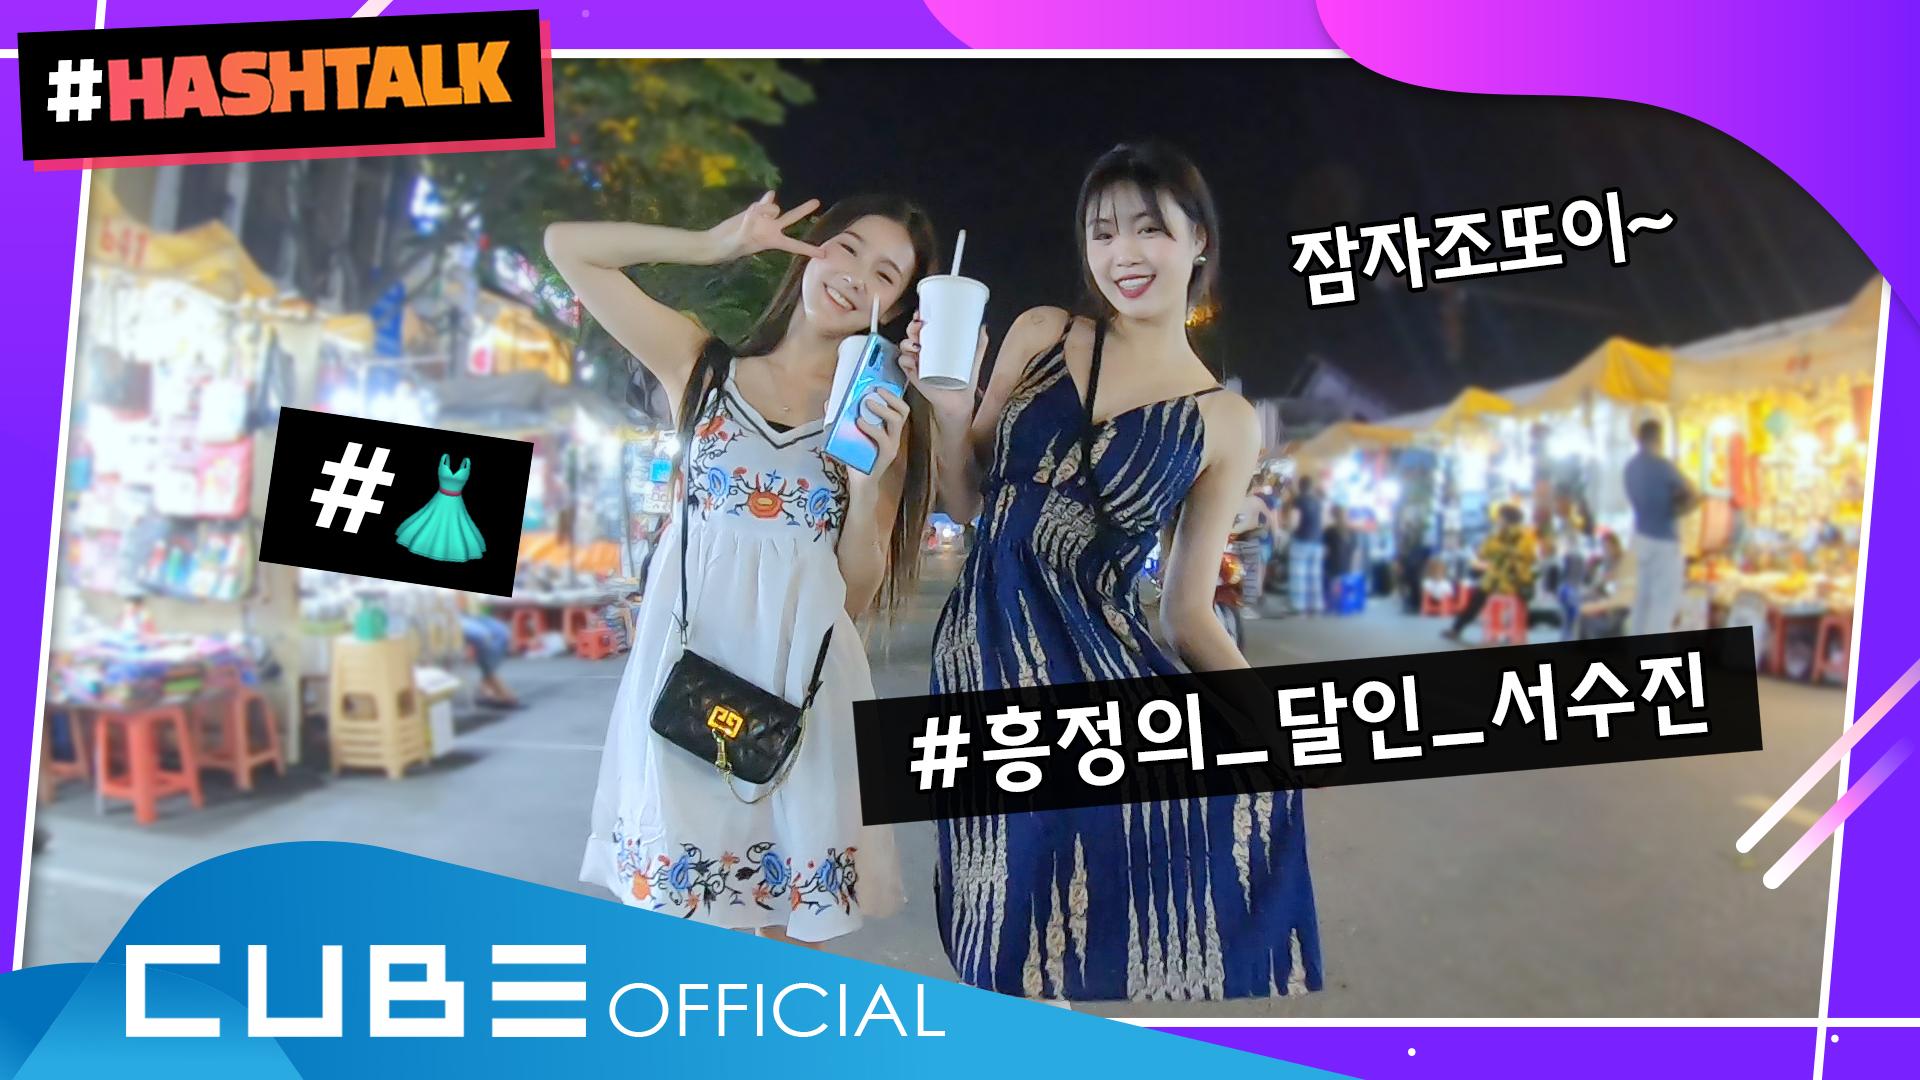 [#HASHTALK] EP.9 흥정의 달인 서수진의 원피스 쇼핑 ㅣ(여자)아이들 ((G)I-DLE)